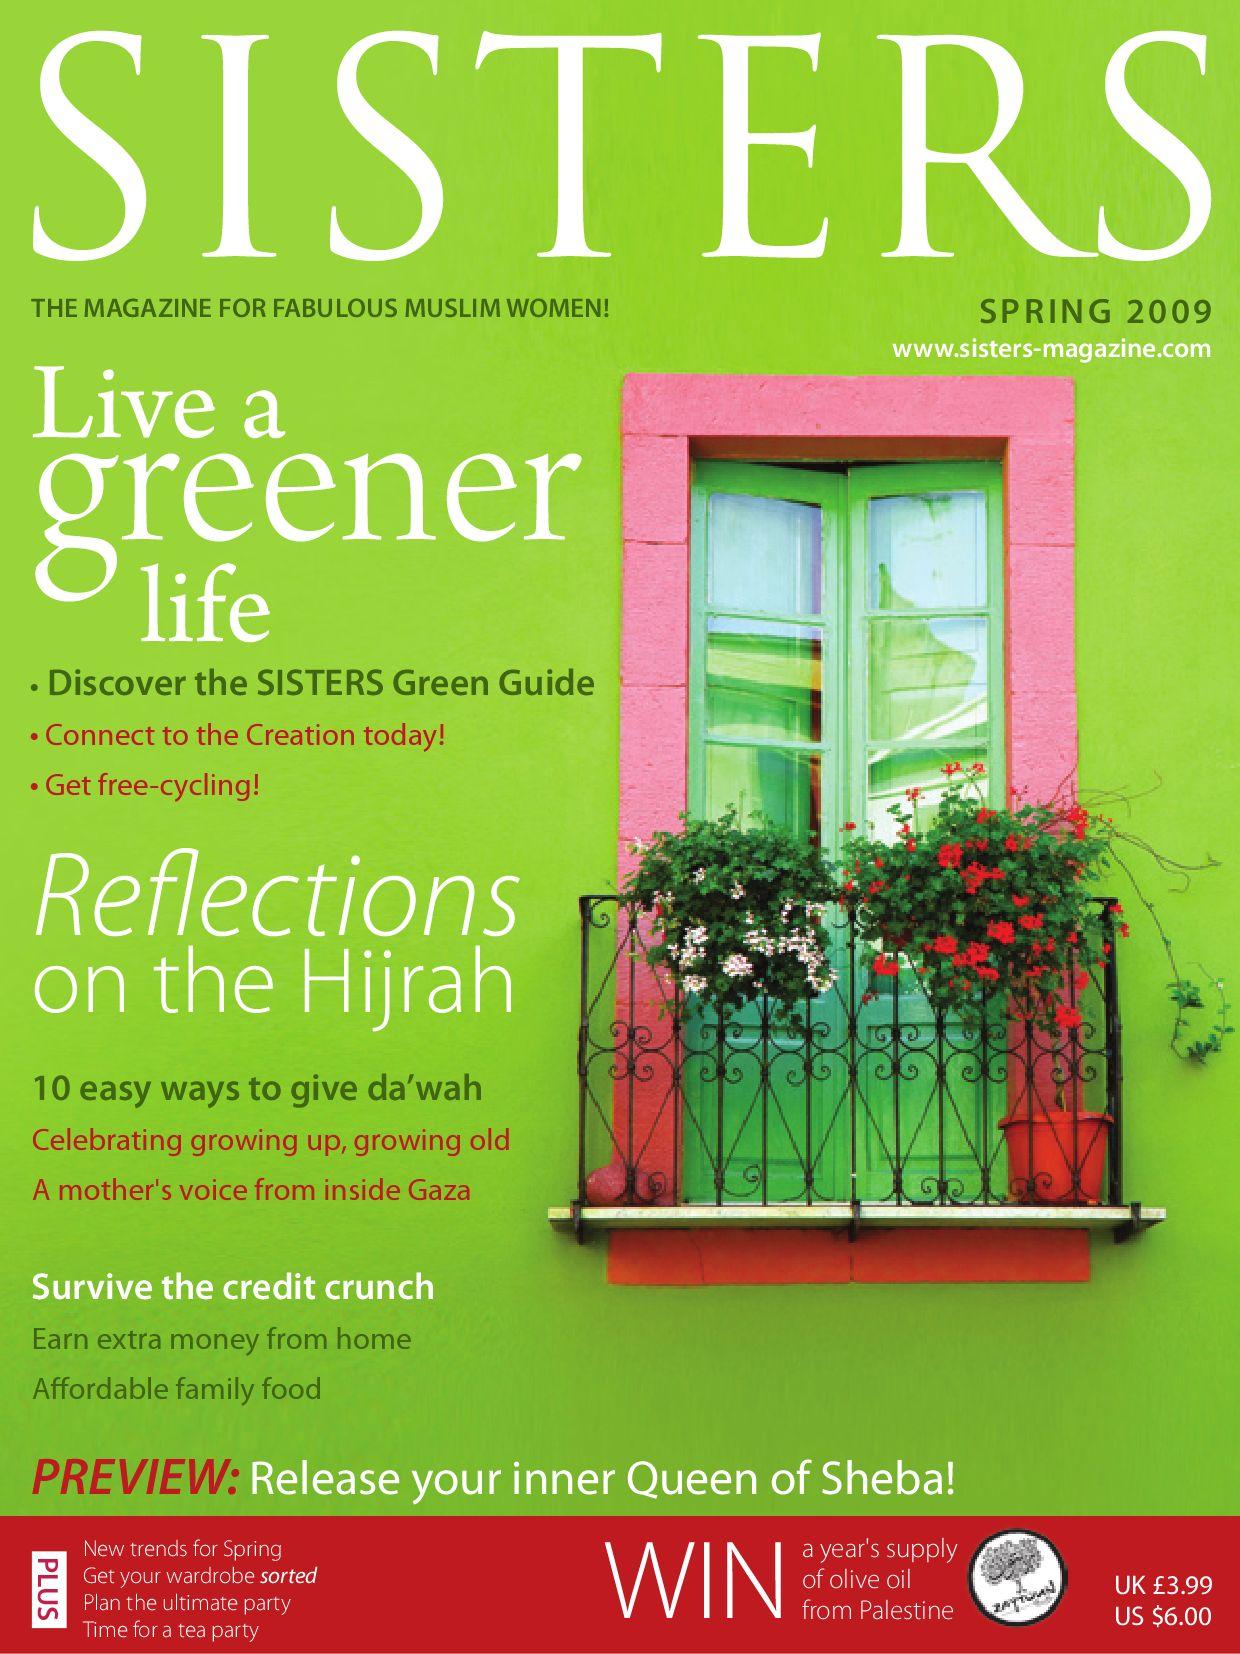 Sisters Magazine By Islamic Focus Issuu Fouring Cube Cm 630 Coffee Brown Parfum Mobil Car Air Freshener 75g